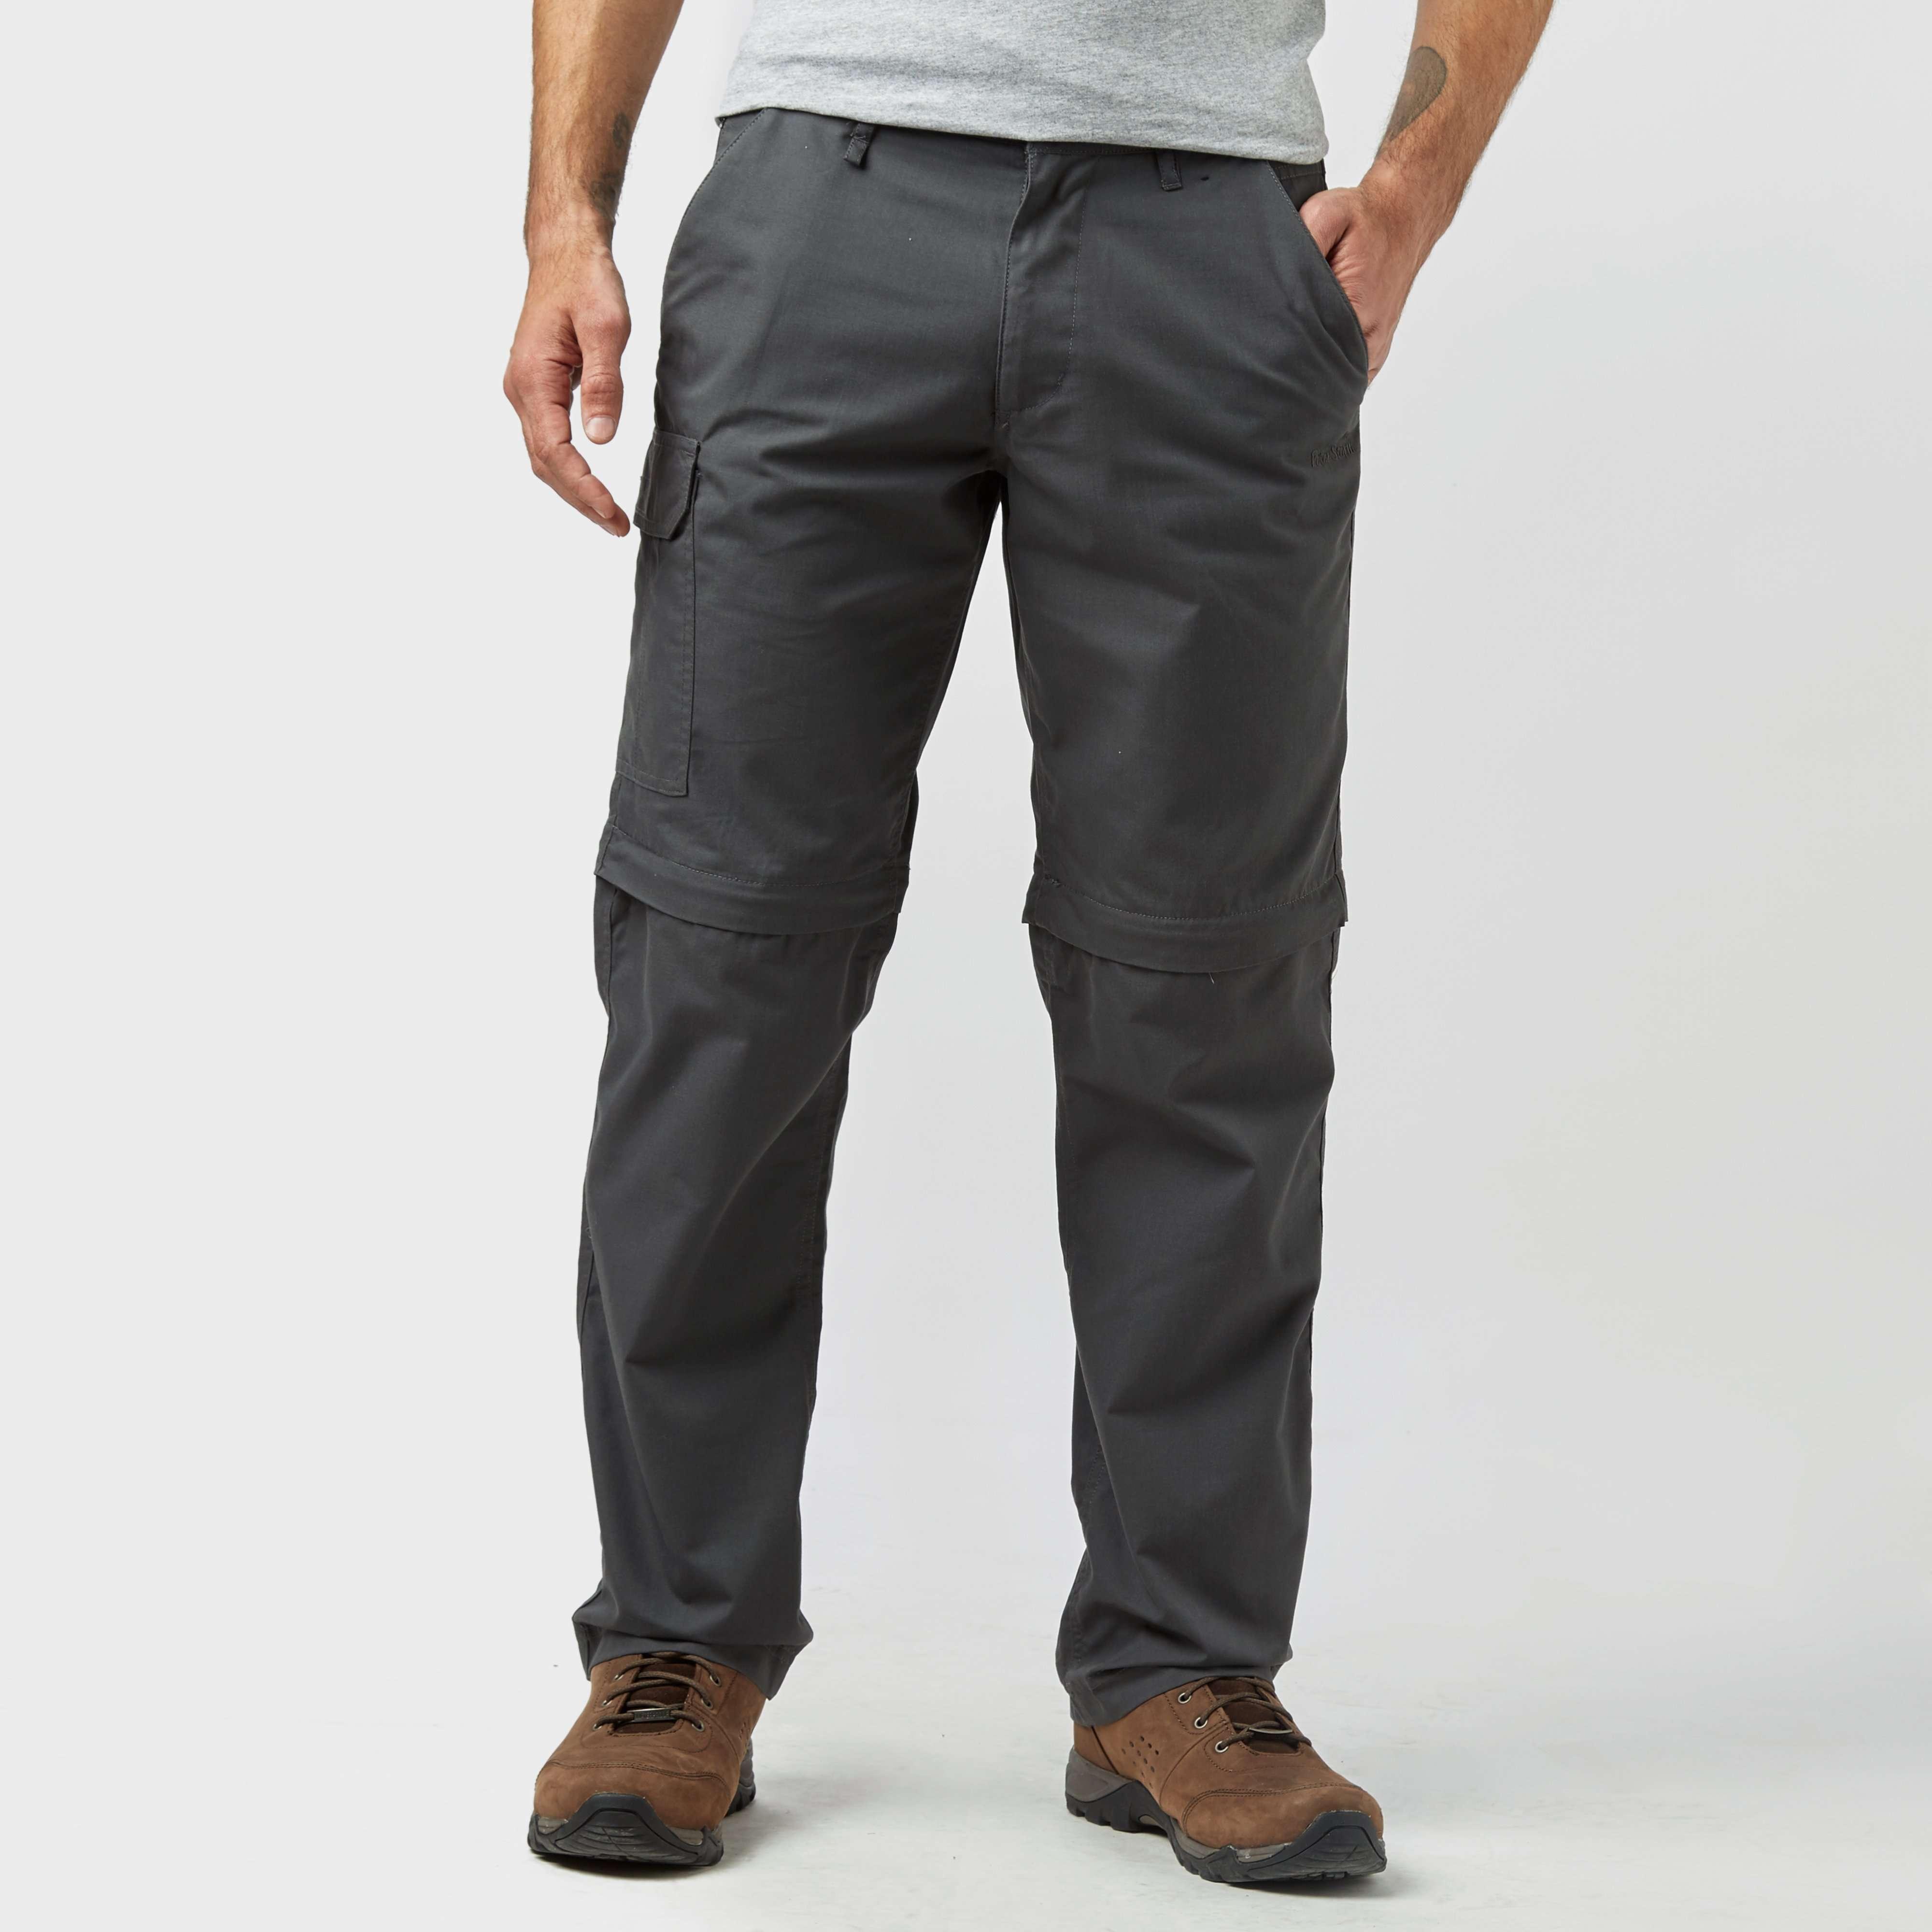 PETER STORM Men's Ramble II Convertible Trousers